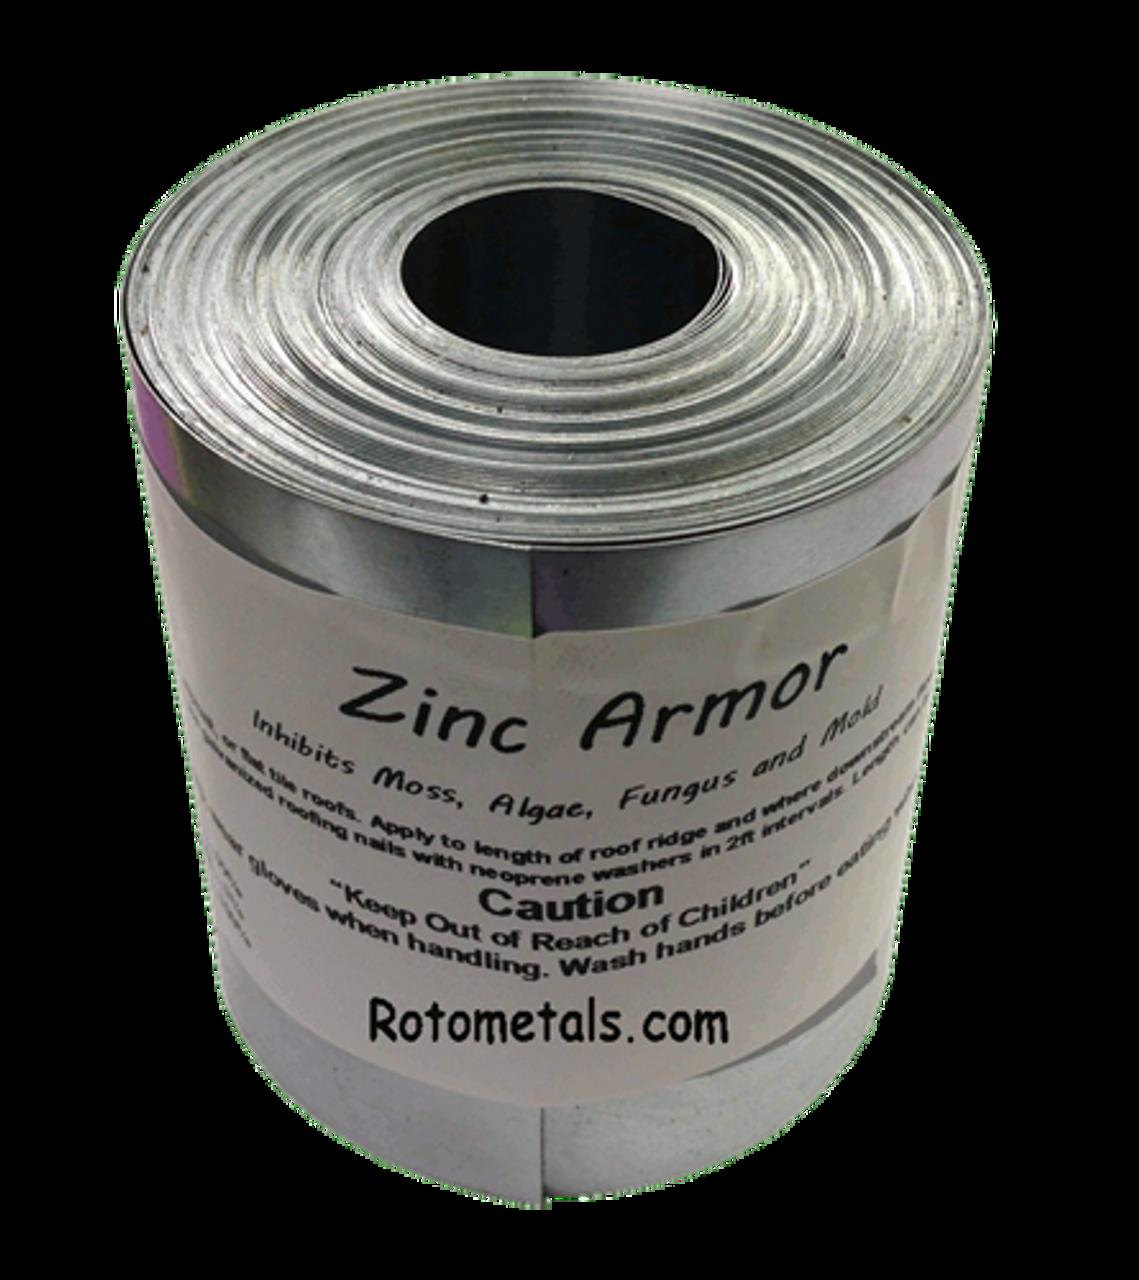 "ZincArmor 3"" Zinc Strip 50 ft Prevent Algae Moss Fungus & Mildew"